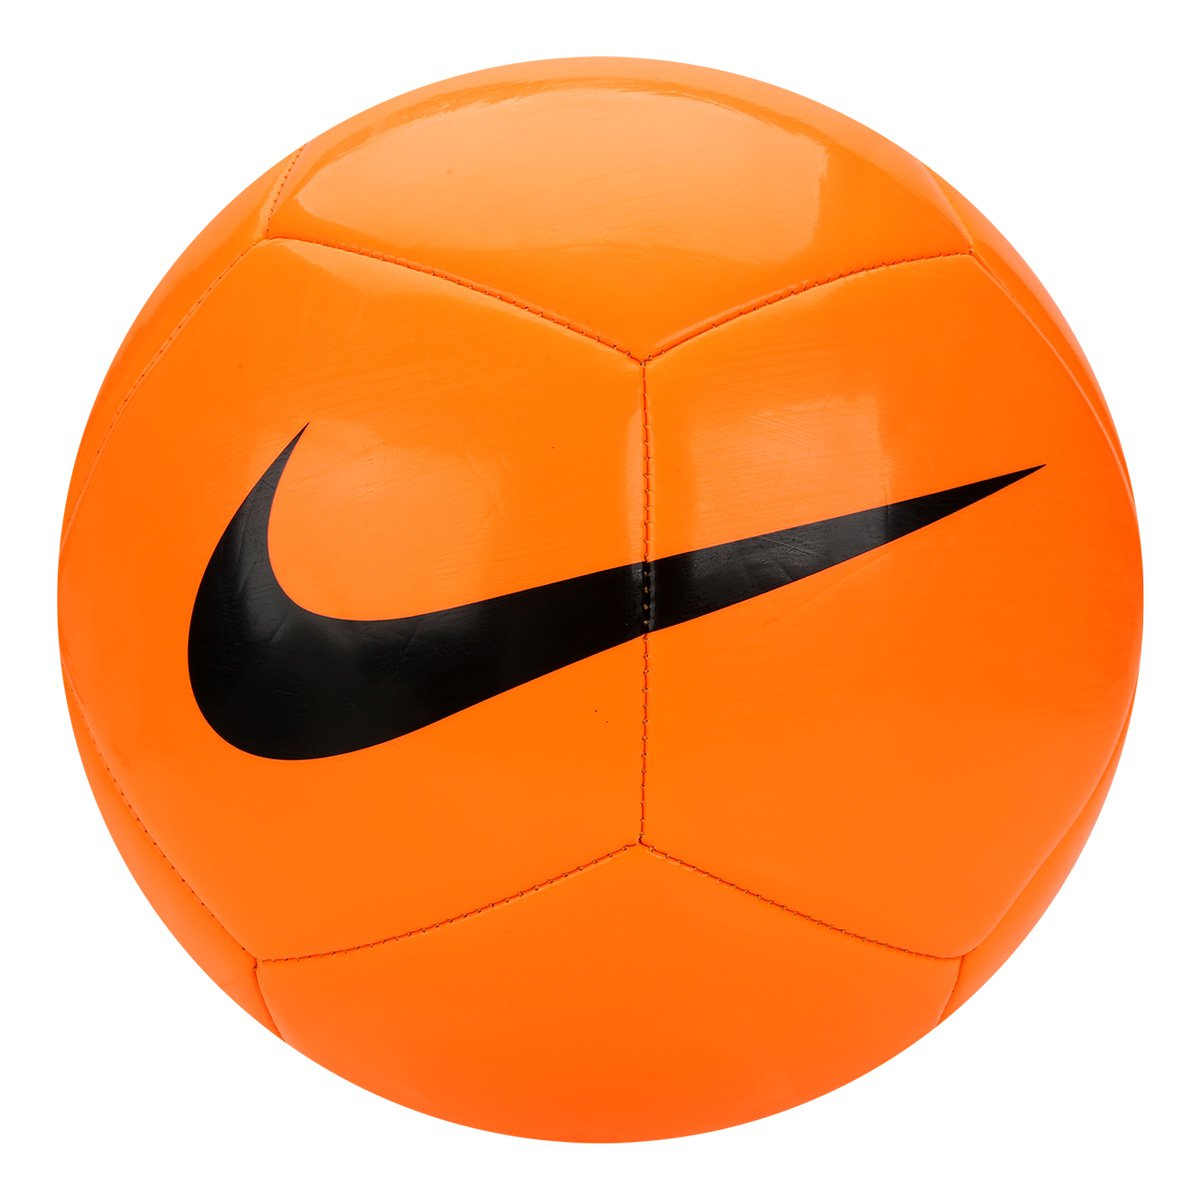 Bola Futebol Campo Nike Pich Team 77e4df9fa71e0